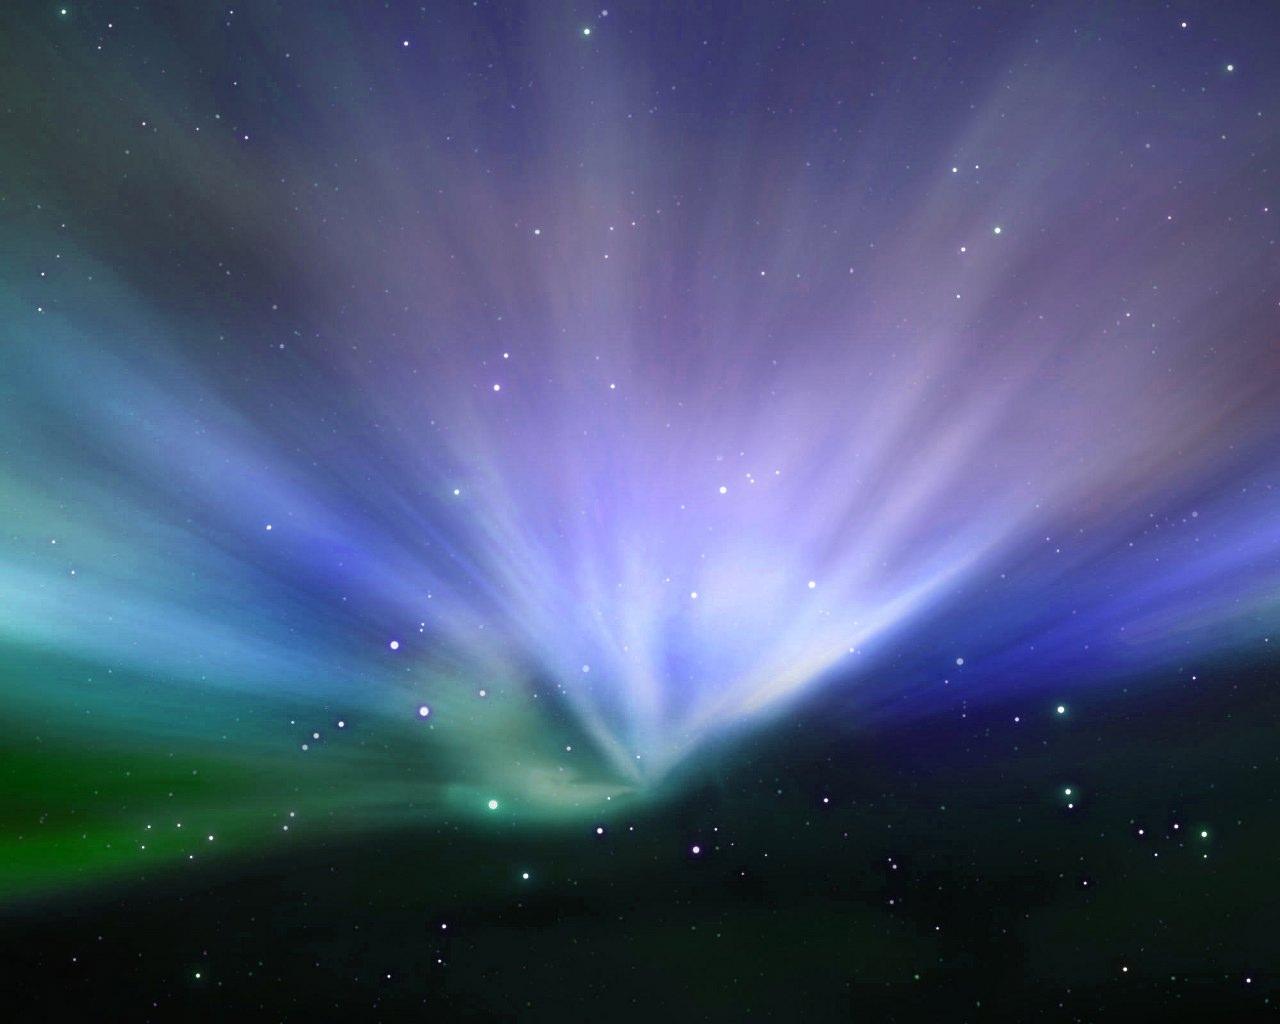 http://1.bp.blogspot.com/_2UbsSBz9ckE/TEHqMPvjKaI/AAAAAAAABRw/-nWcYn8DIP8/s1600/aurora+mac11_1280x1024.jpg